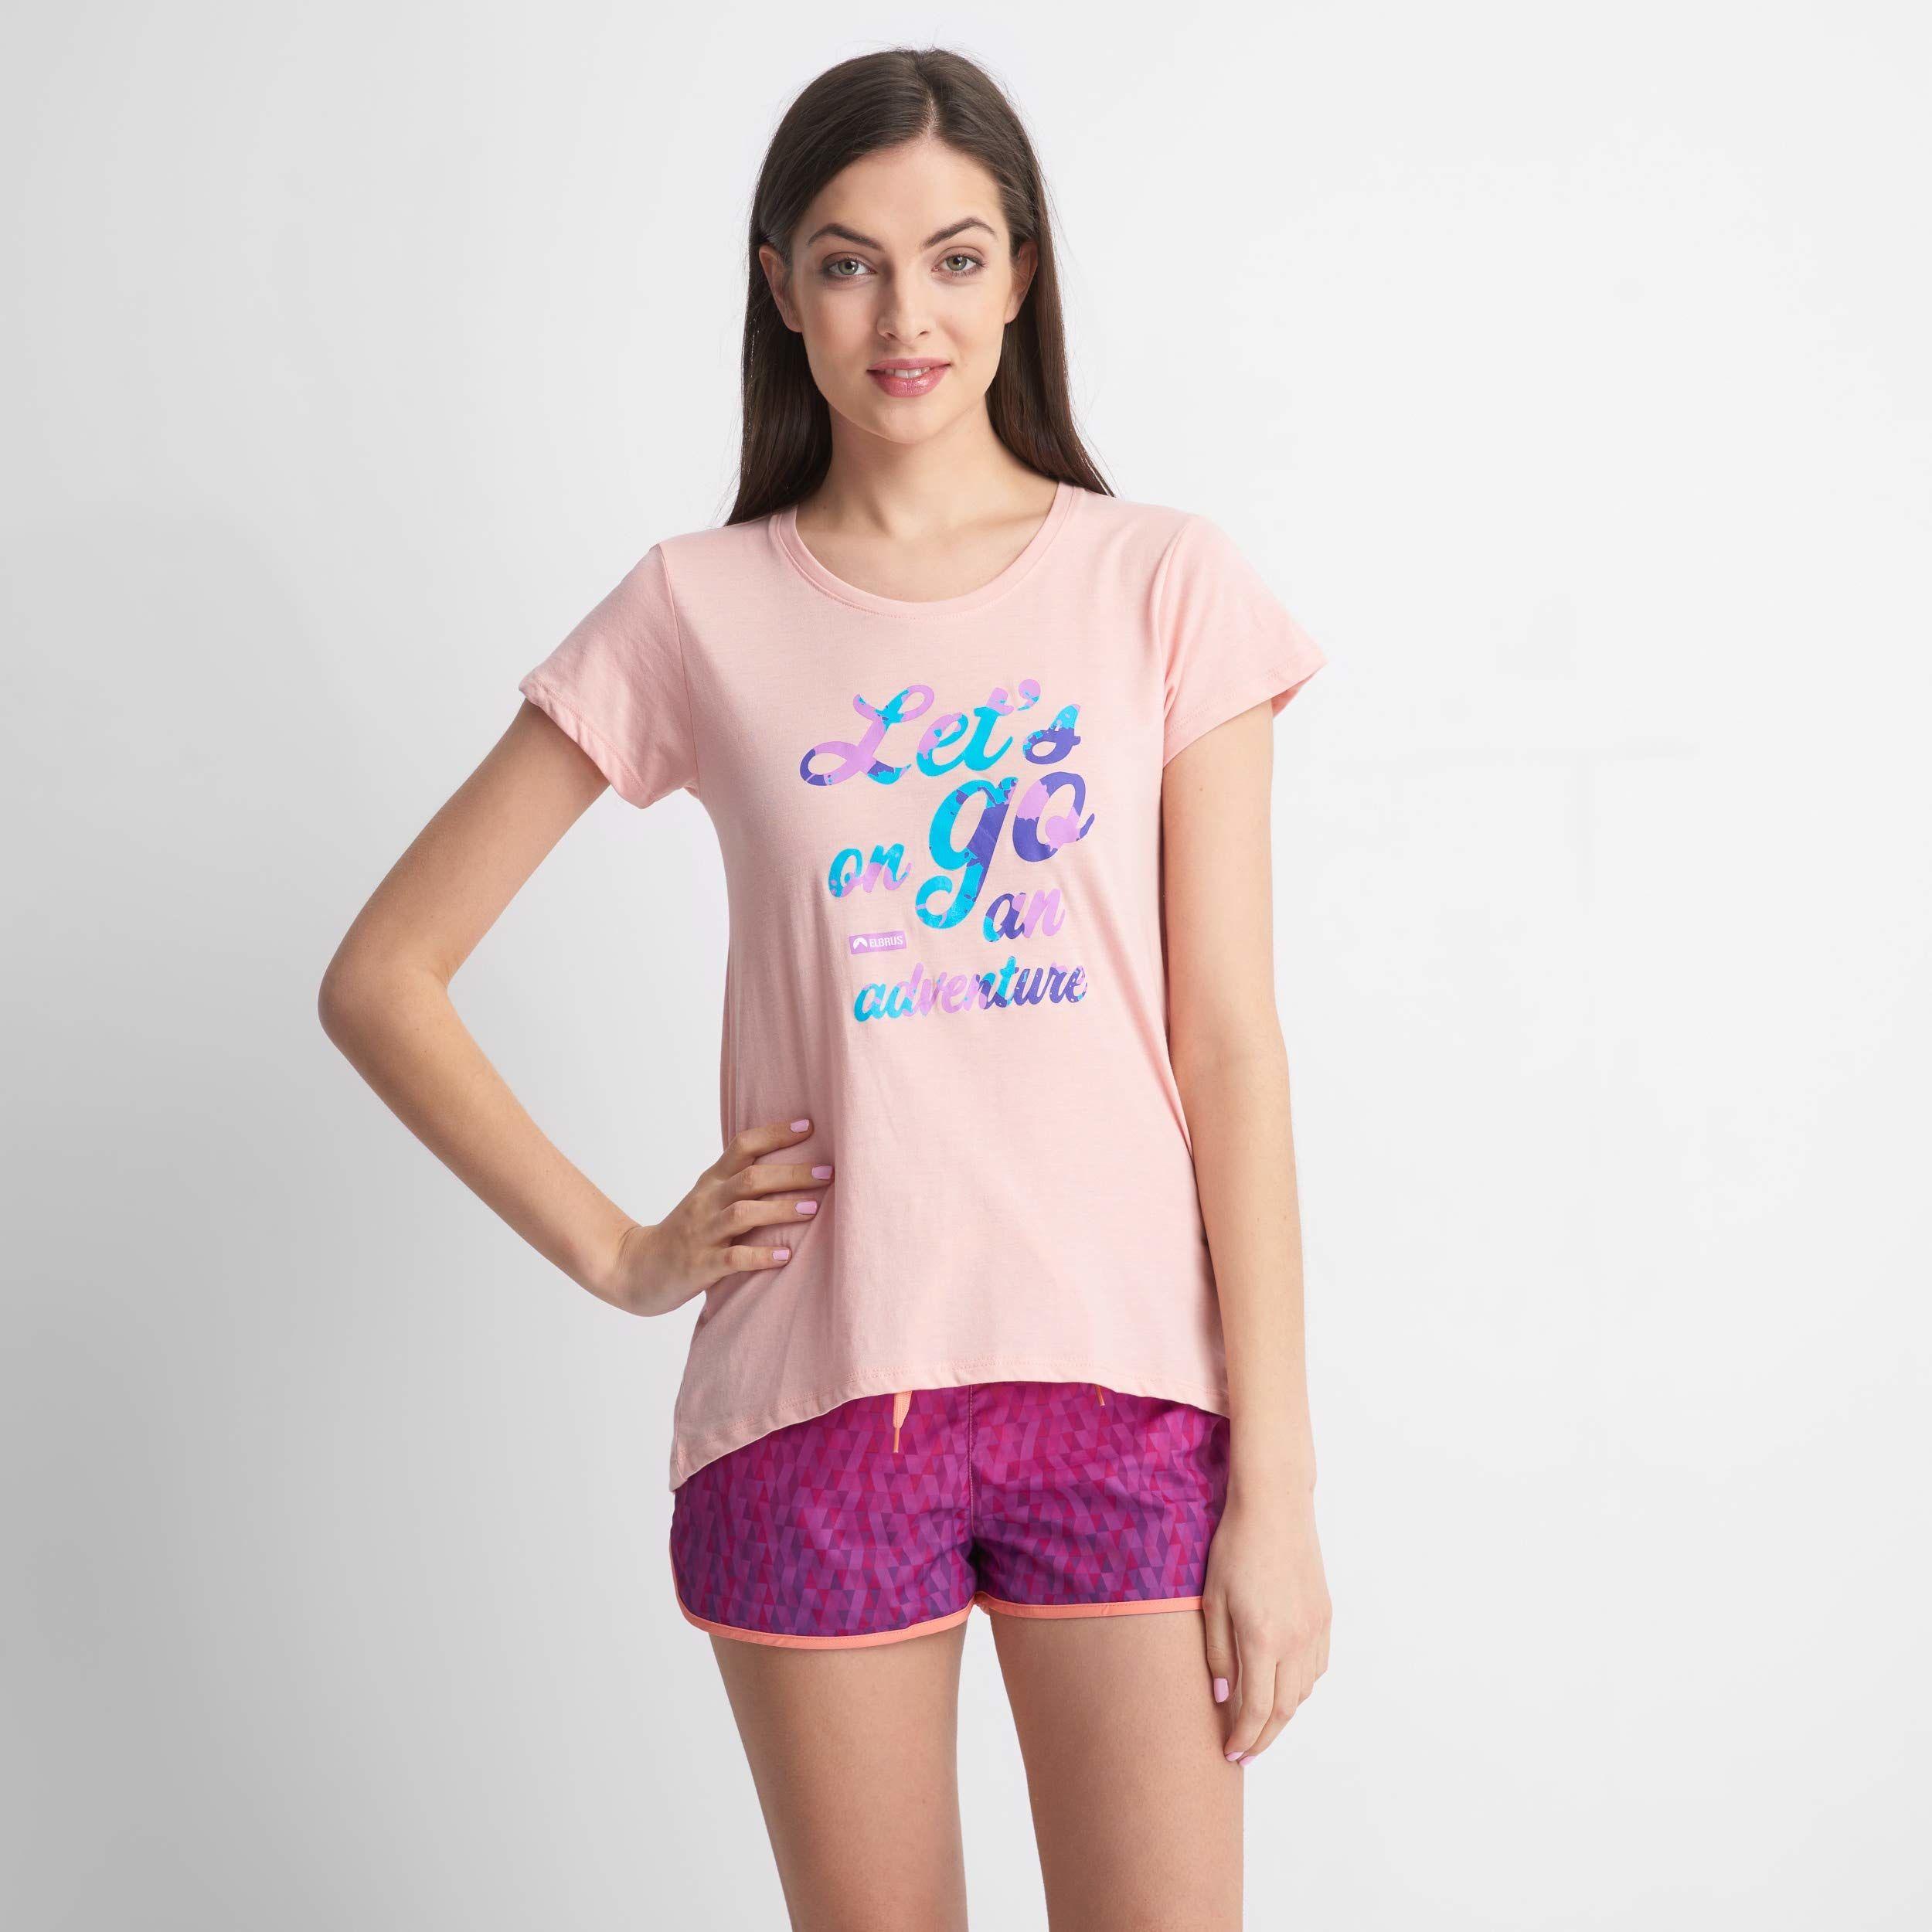 ELBRUS EMAS WO''S t-shirt, jasnoróżowy, L